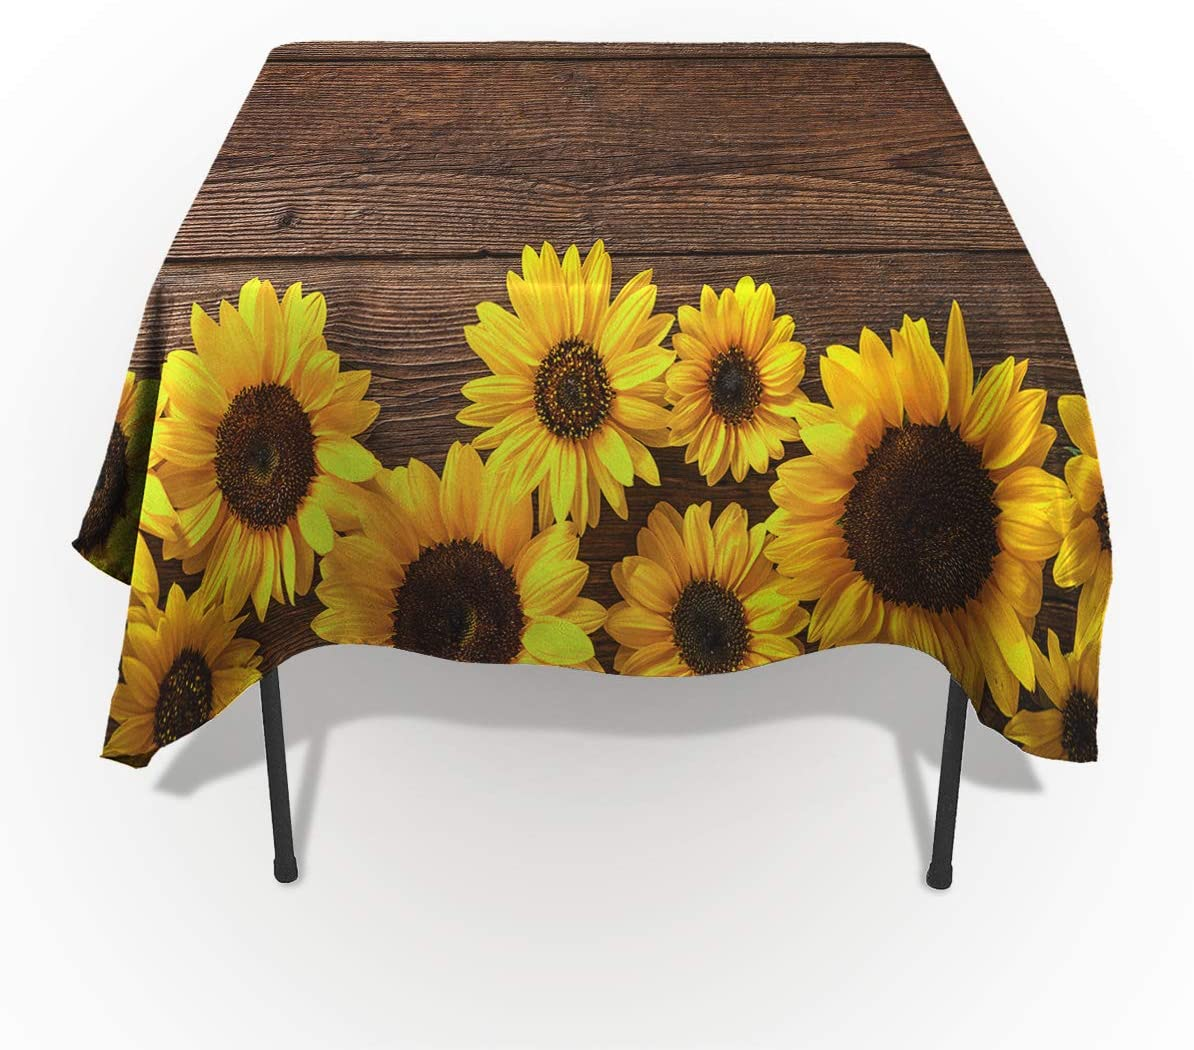 Cotton Linen Tablecloth 54